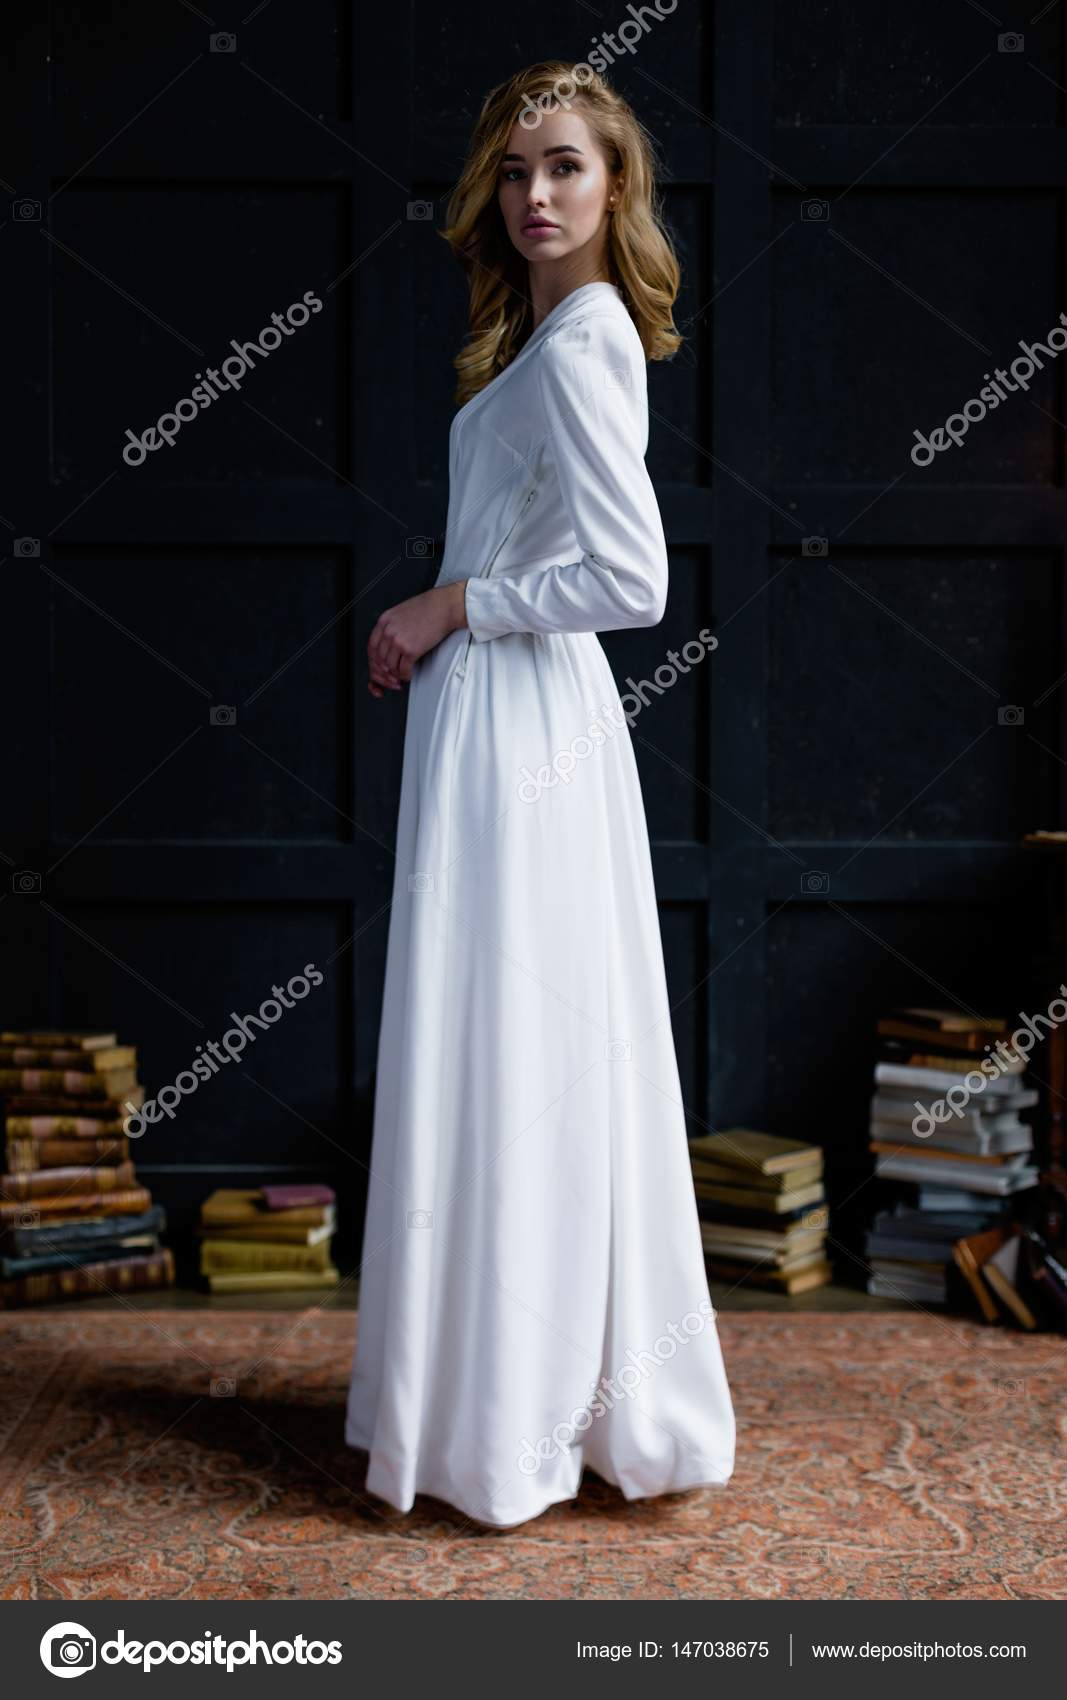 be147c72a140 γυναίκα στο λευκό μακρύ φόρεμα — Φωτογραφία Αρχείου © smmartynenko ...